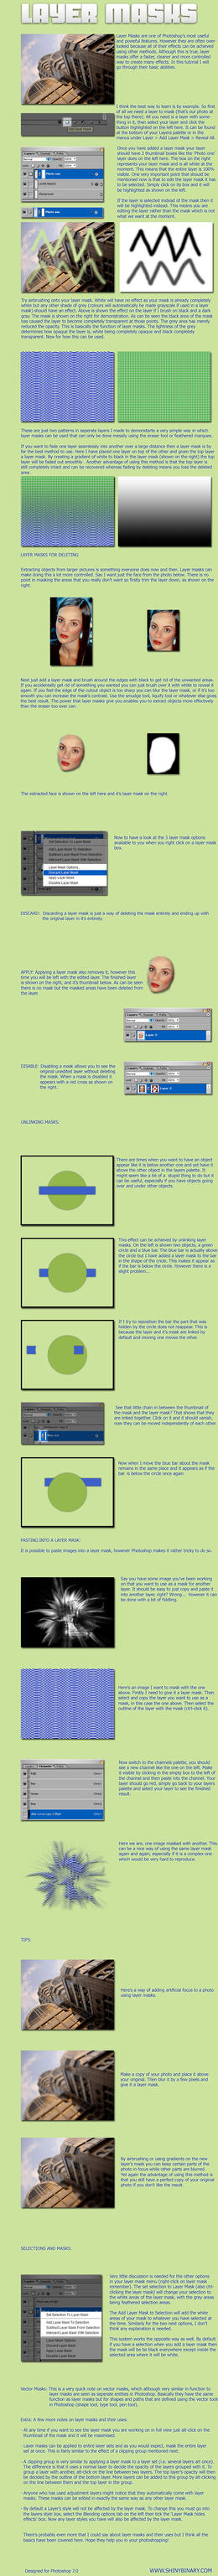 Layer Mask tutorial by Shinybinary